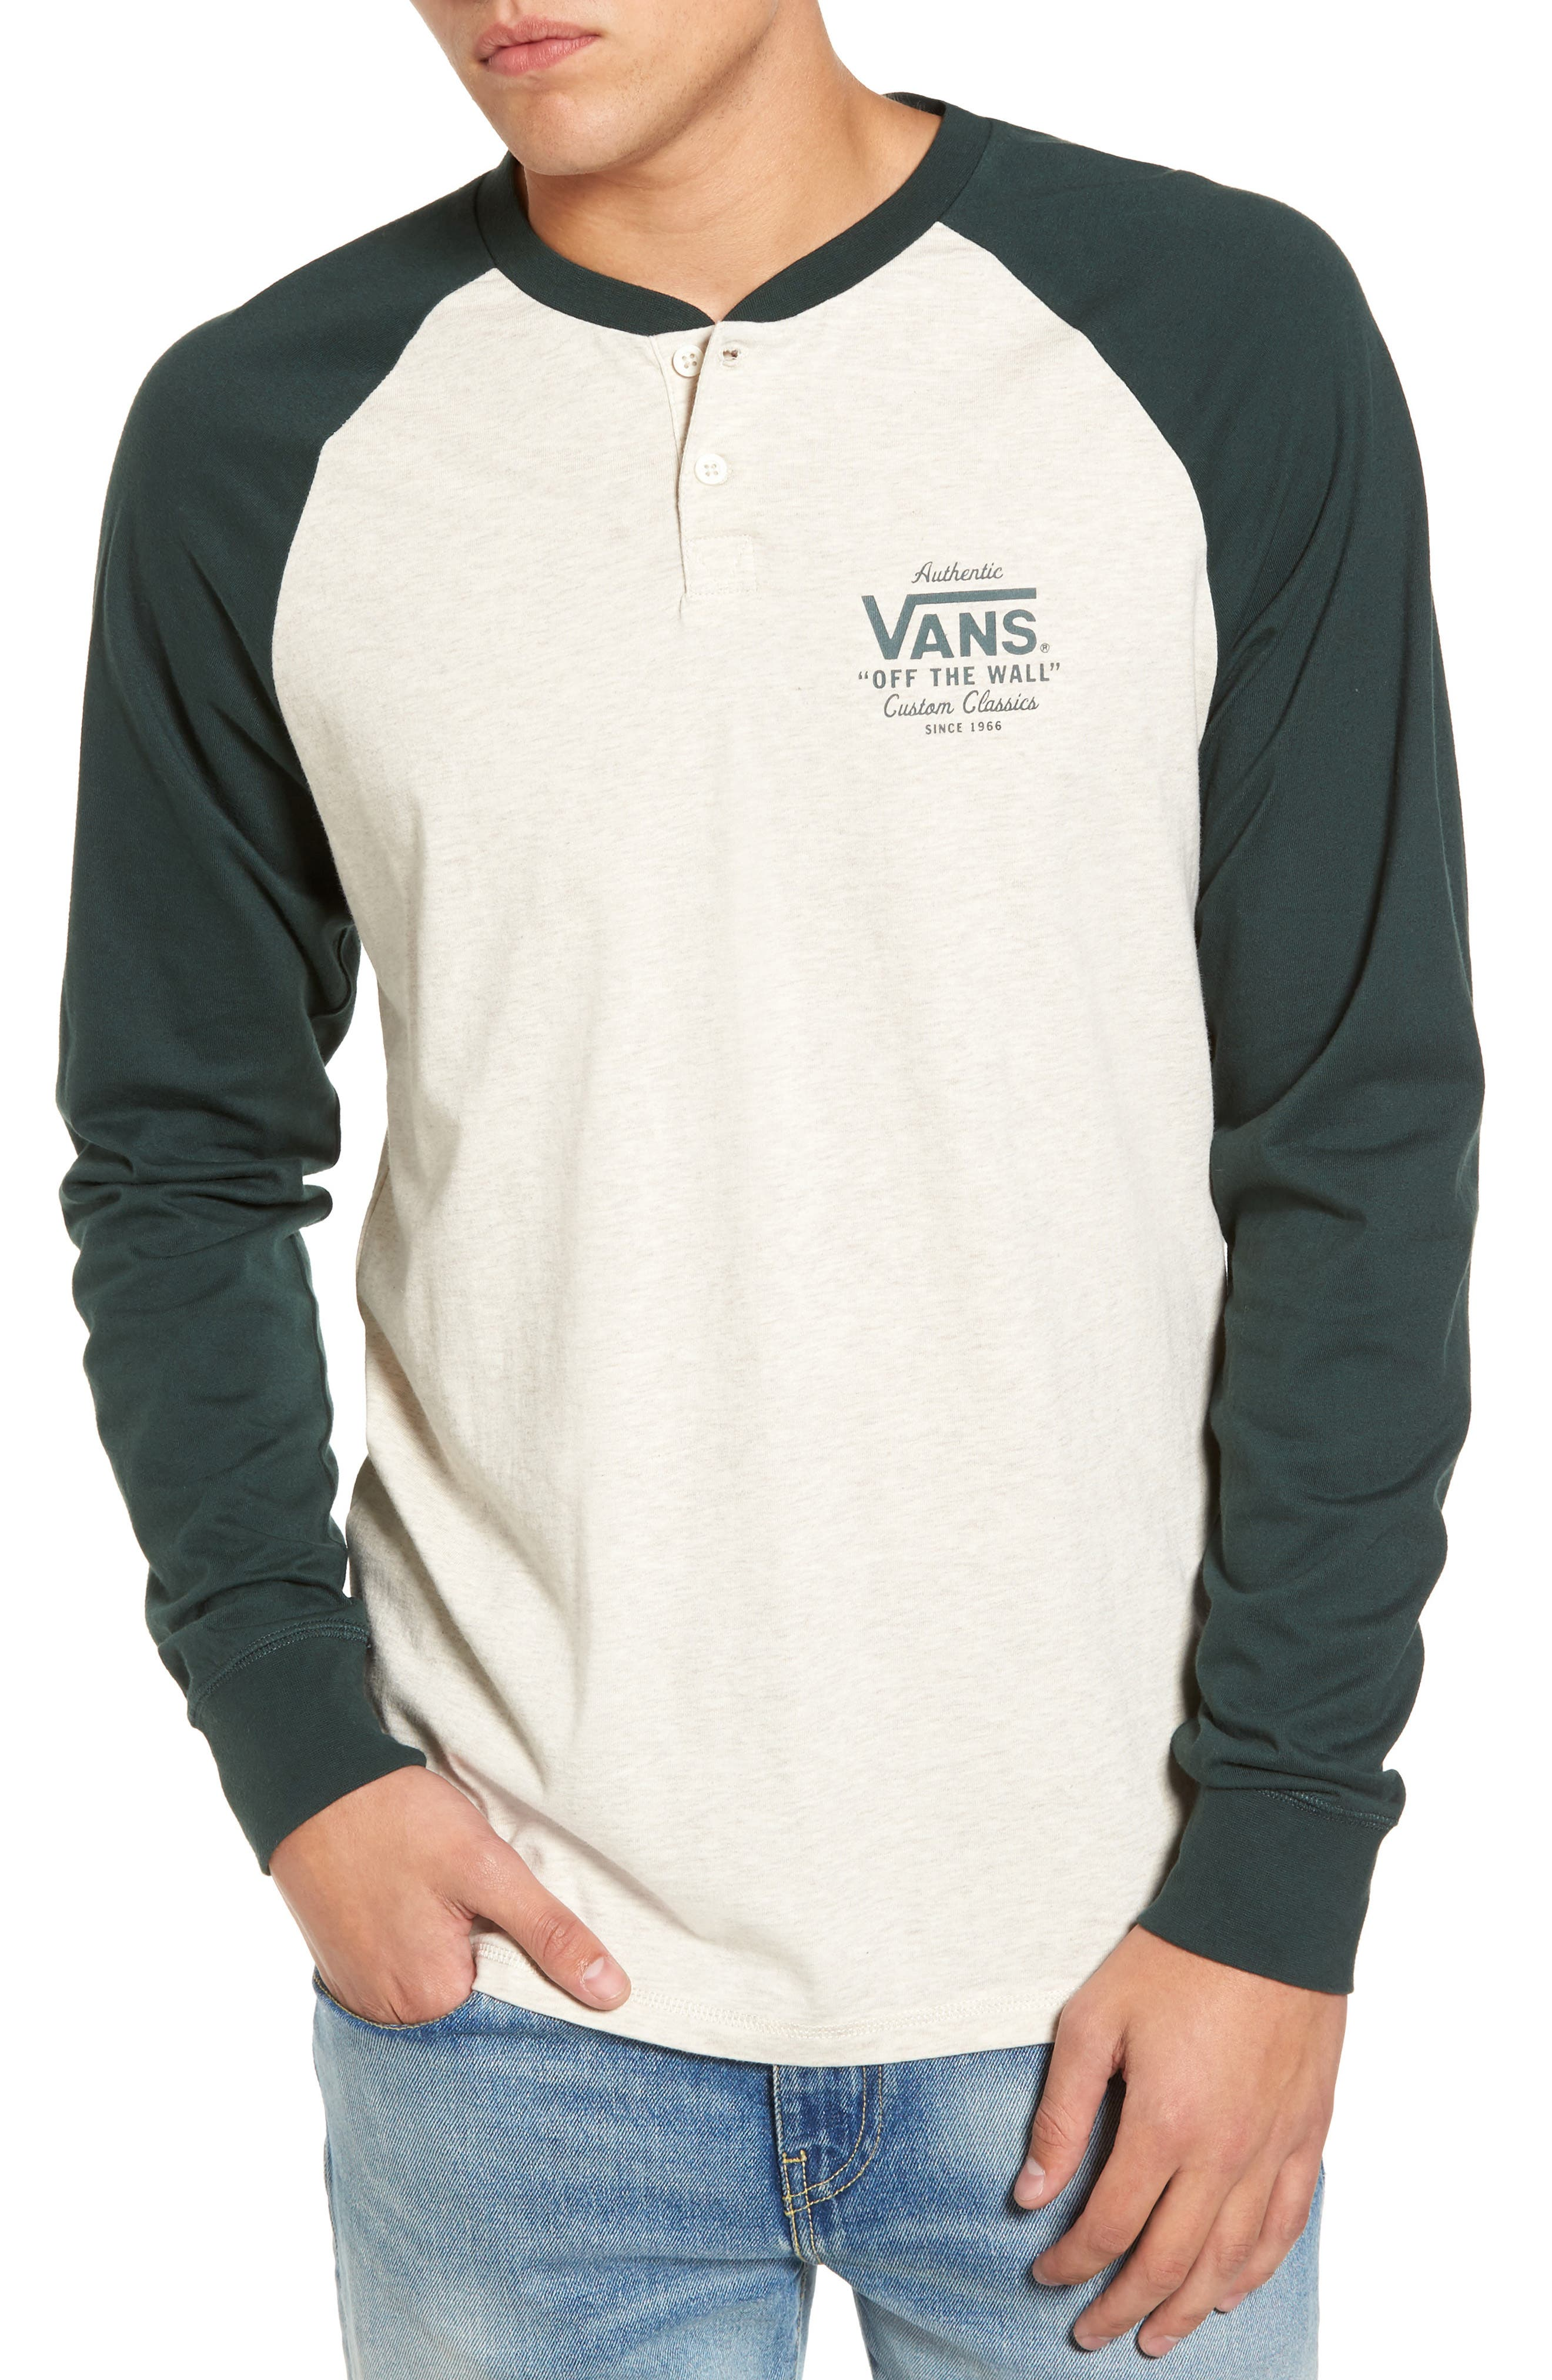 Vans Denton Graphic T-Shirt